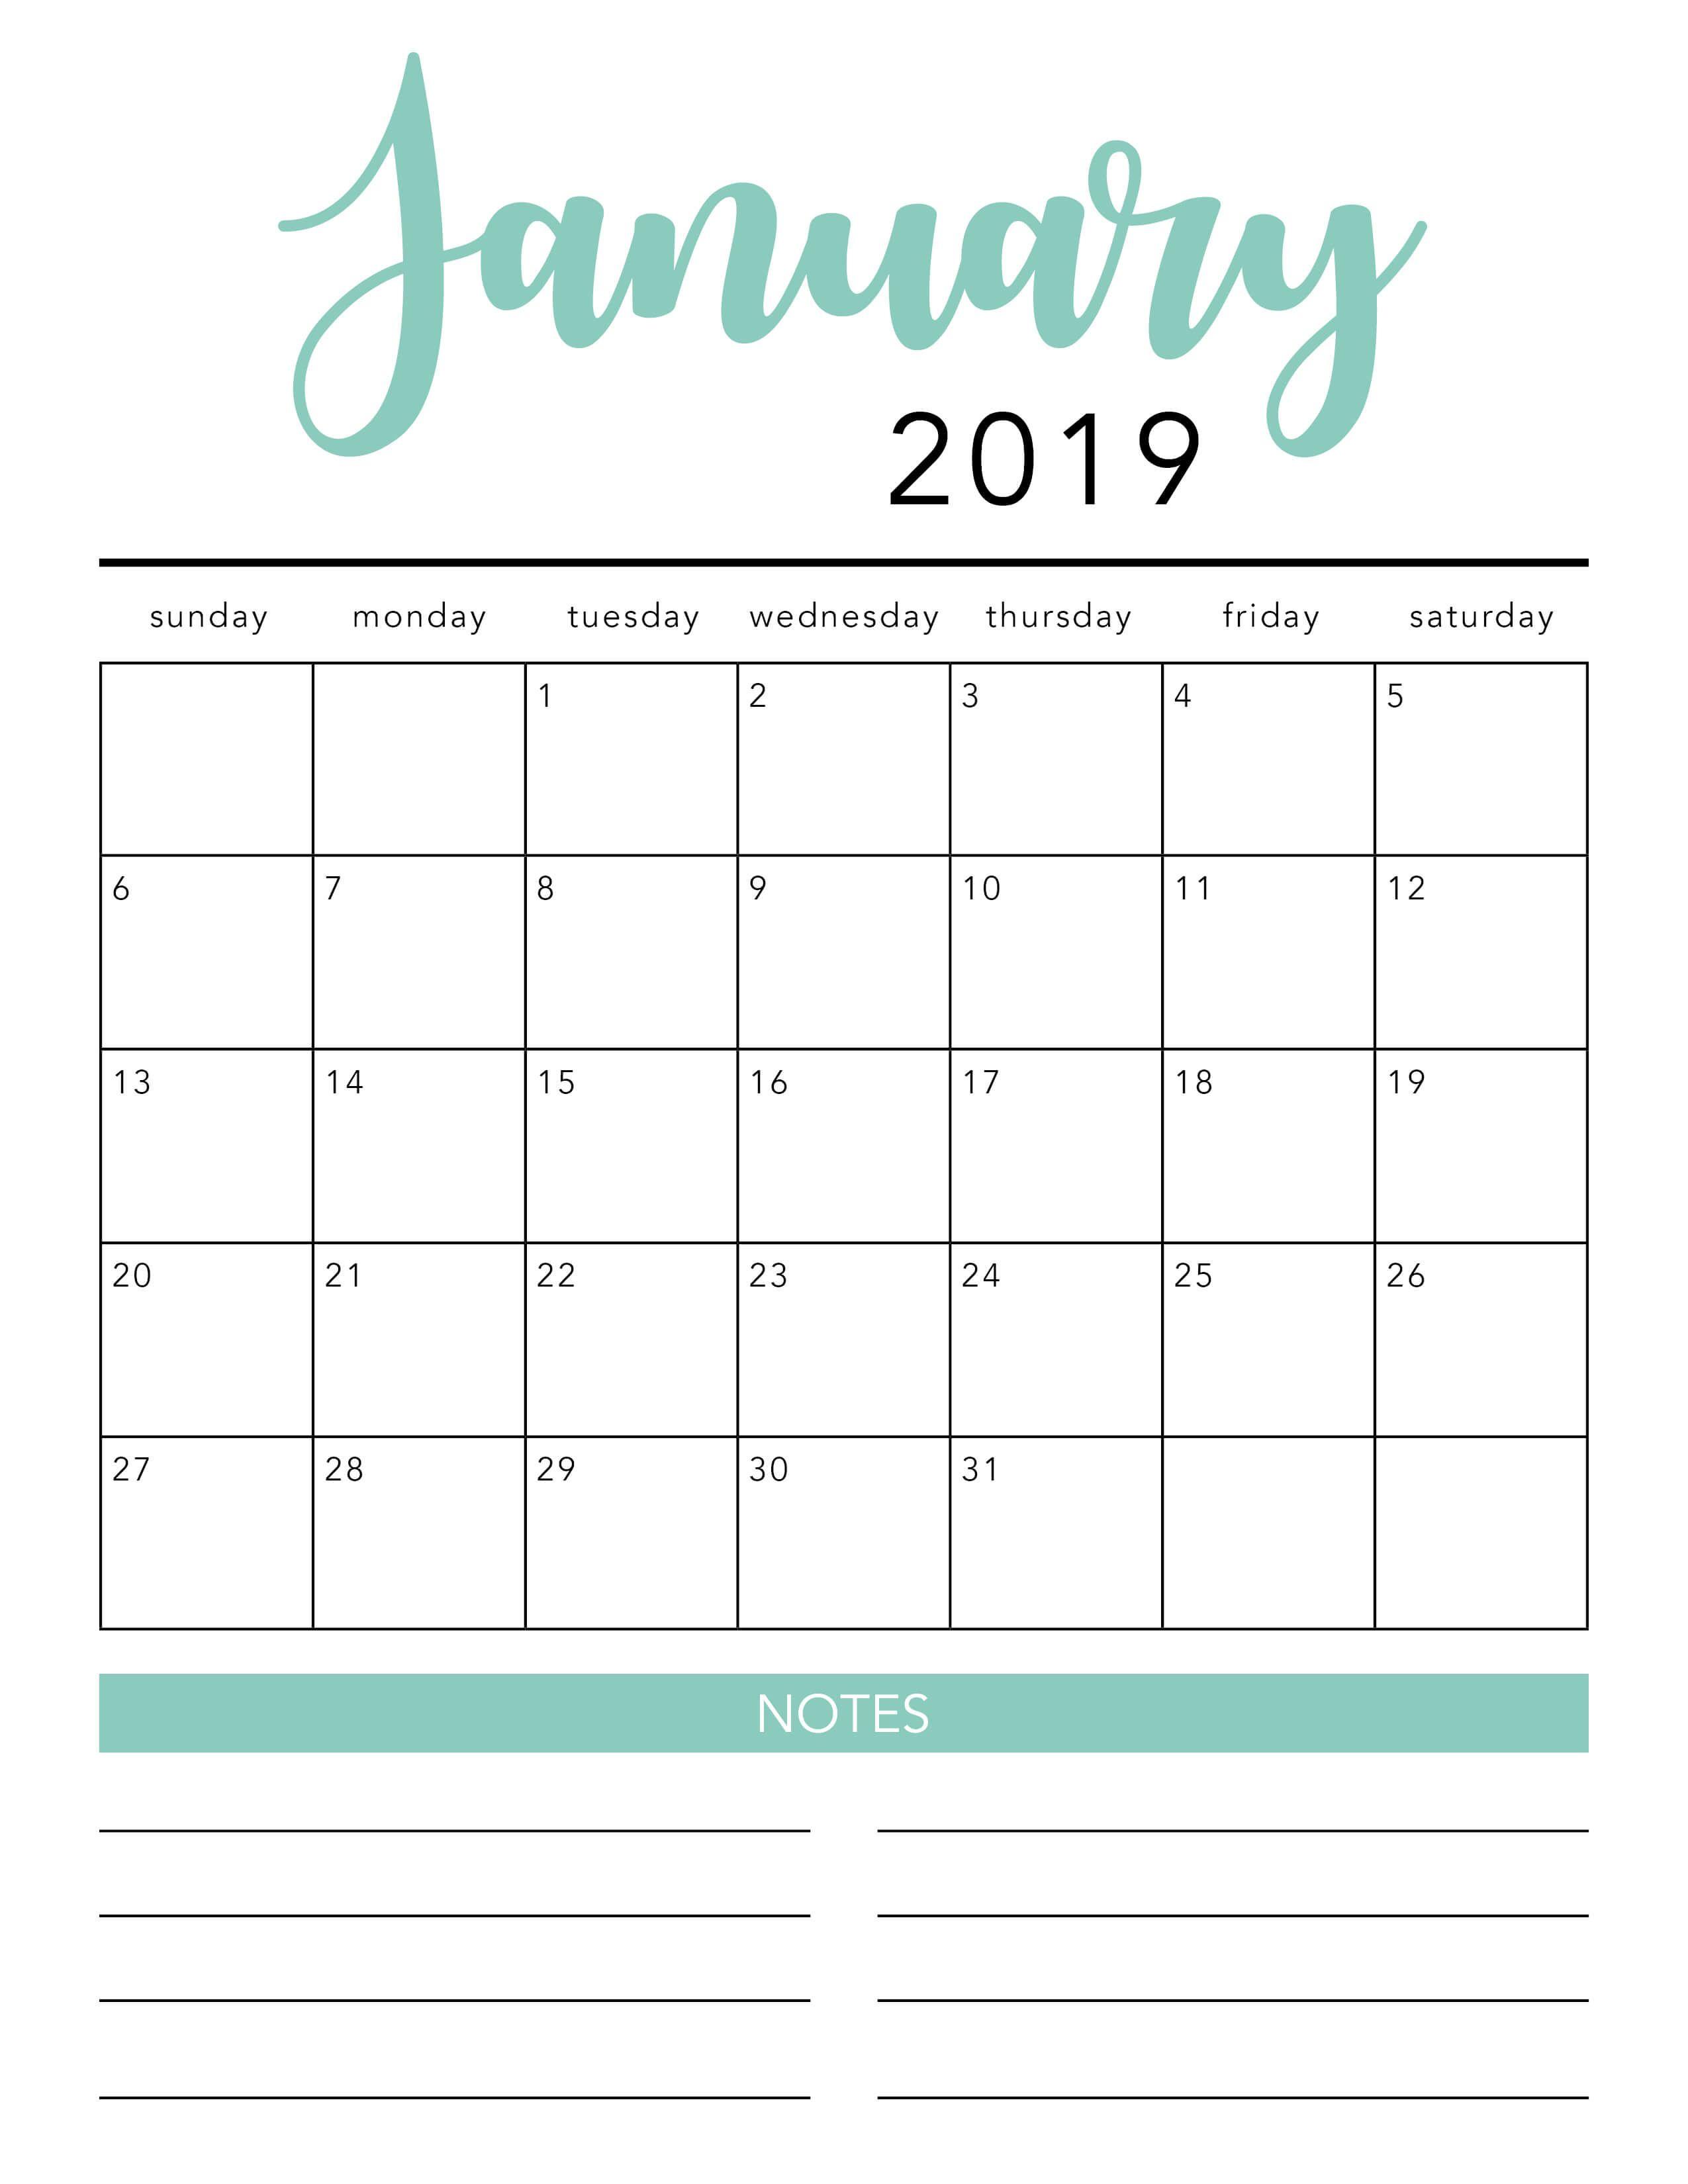 Free 2019 Printable Calendar Template (2 Colors!) - I Heart Naptime pertaining to Free Blank Calendar Sheets